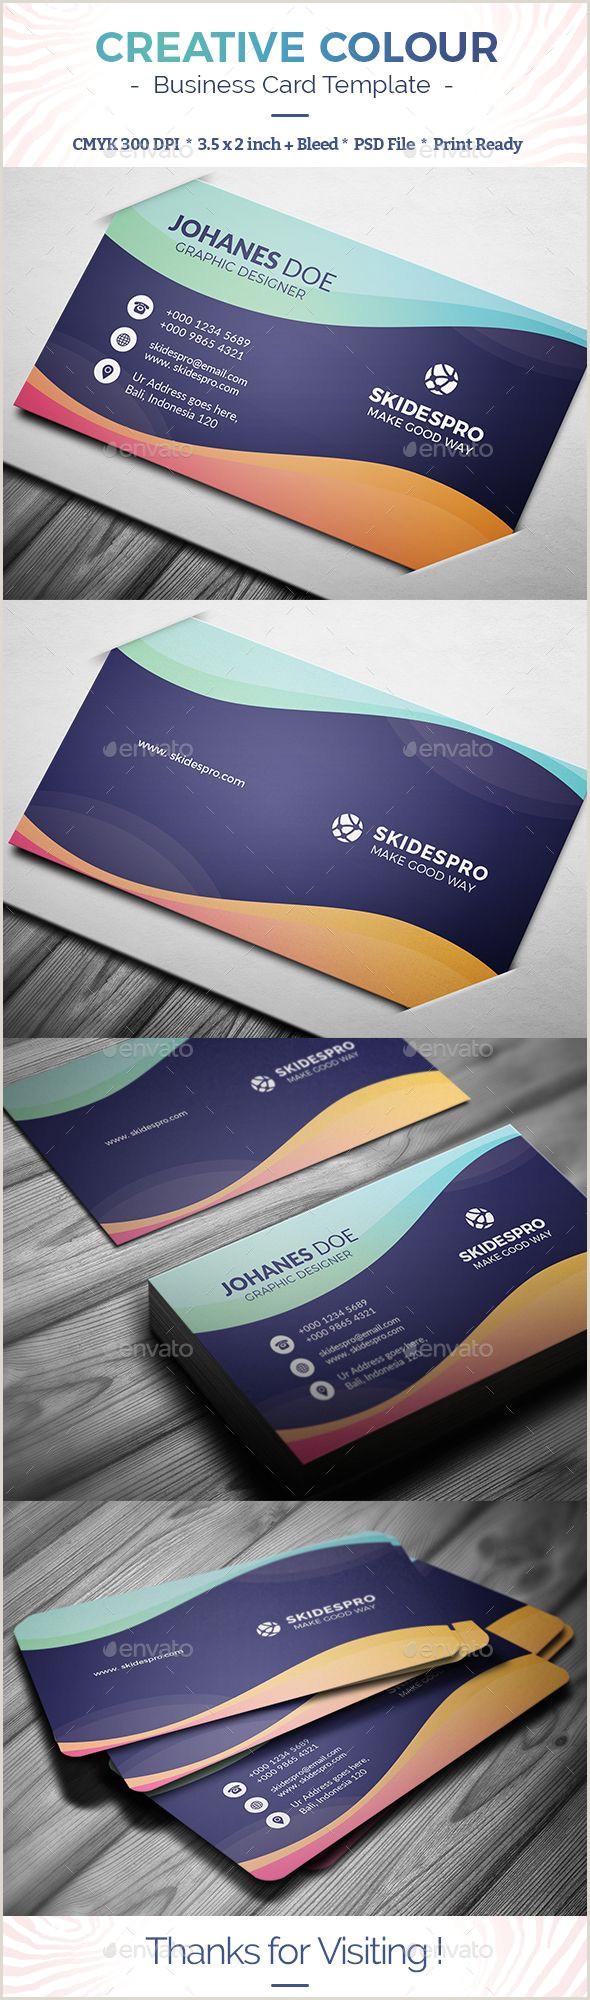 Business Card Colors Creative Colour Business Cards Print Templates